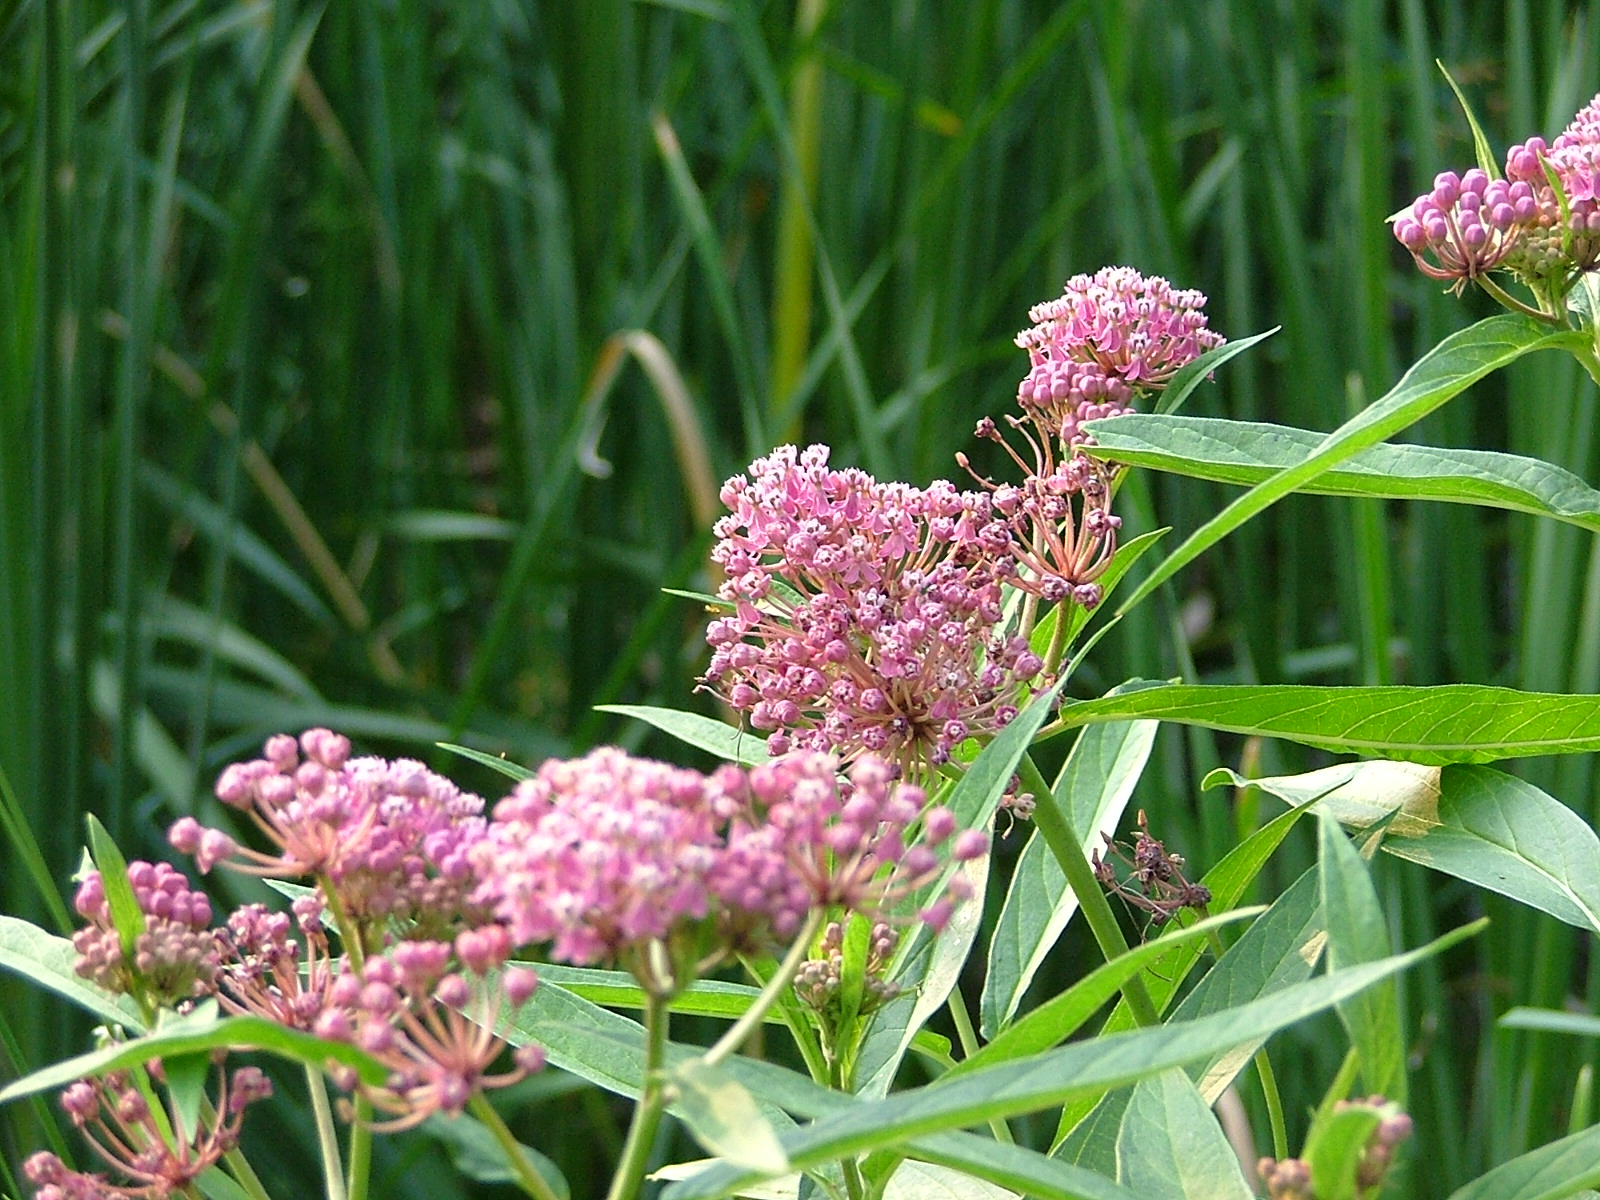 Grow Me Instead - Brooklin Horticultural Socie